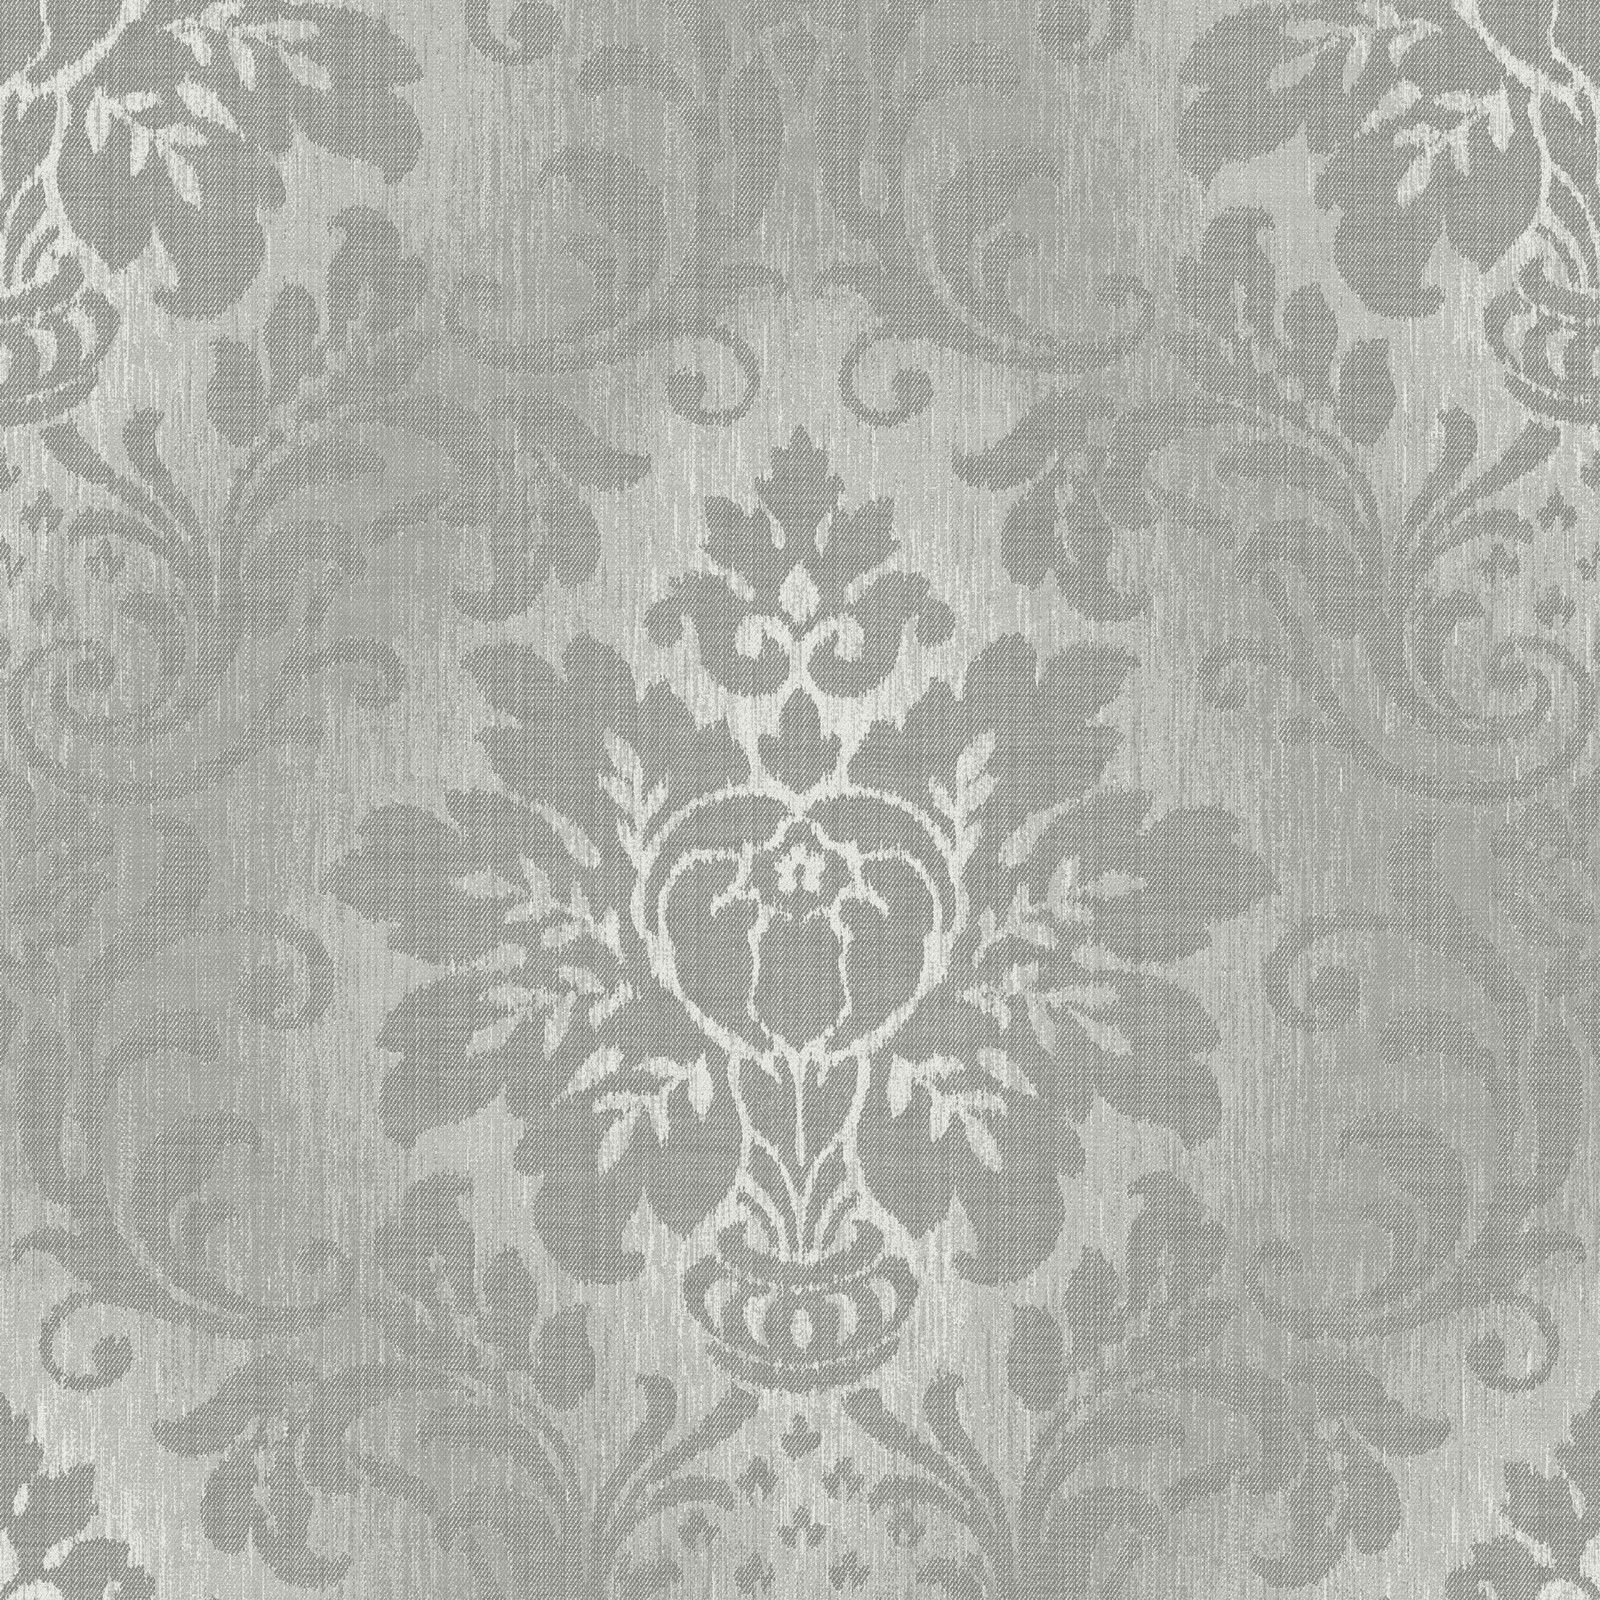 grandeco tapete luxus k niglich damast stoff grau. Black Bedroom Furniture Sets. Home Design Ideas